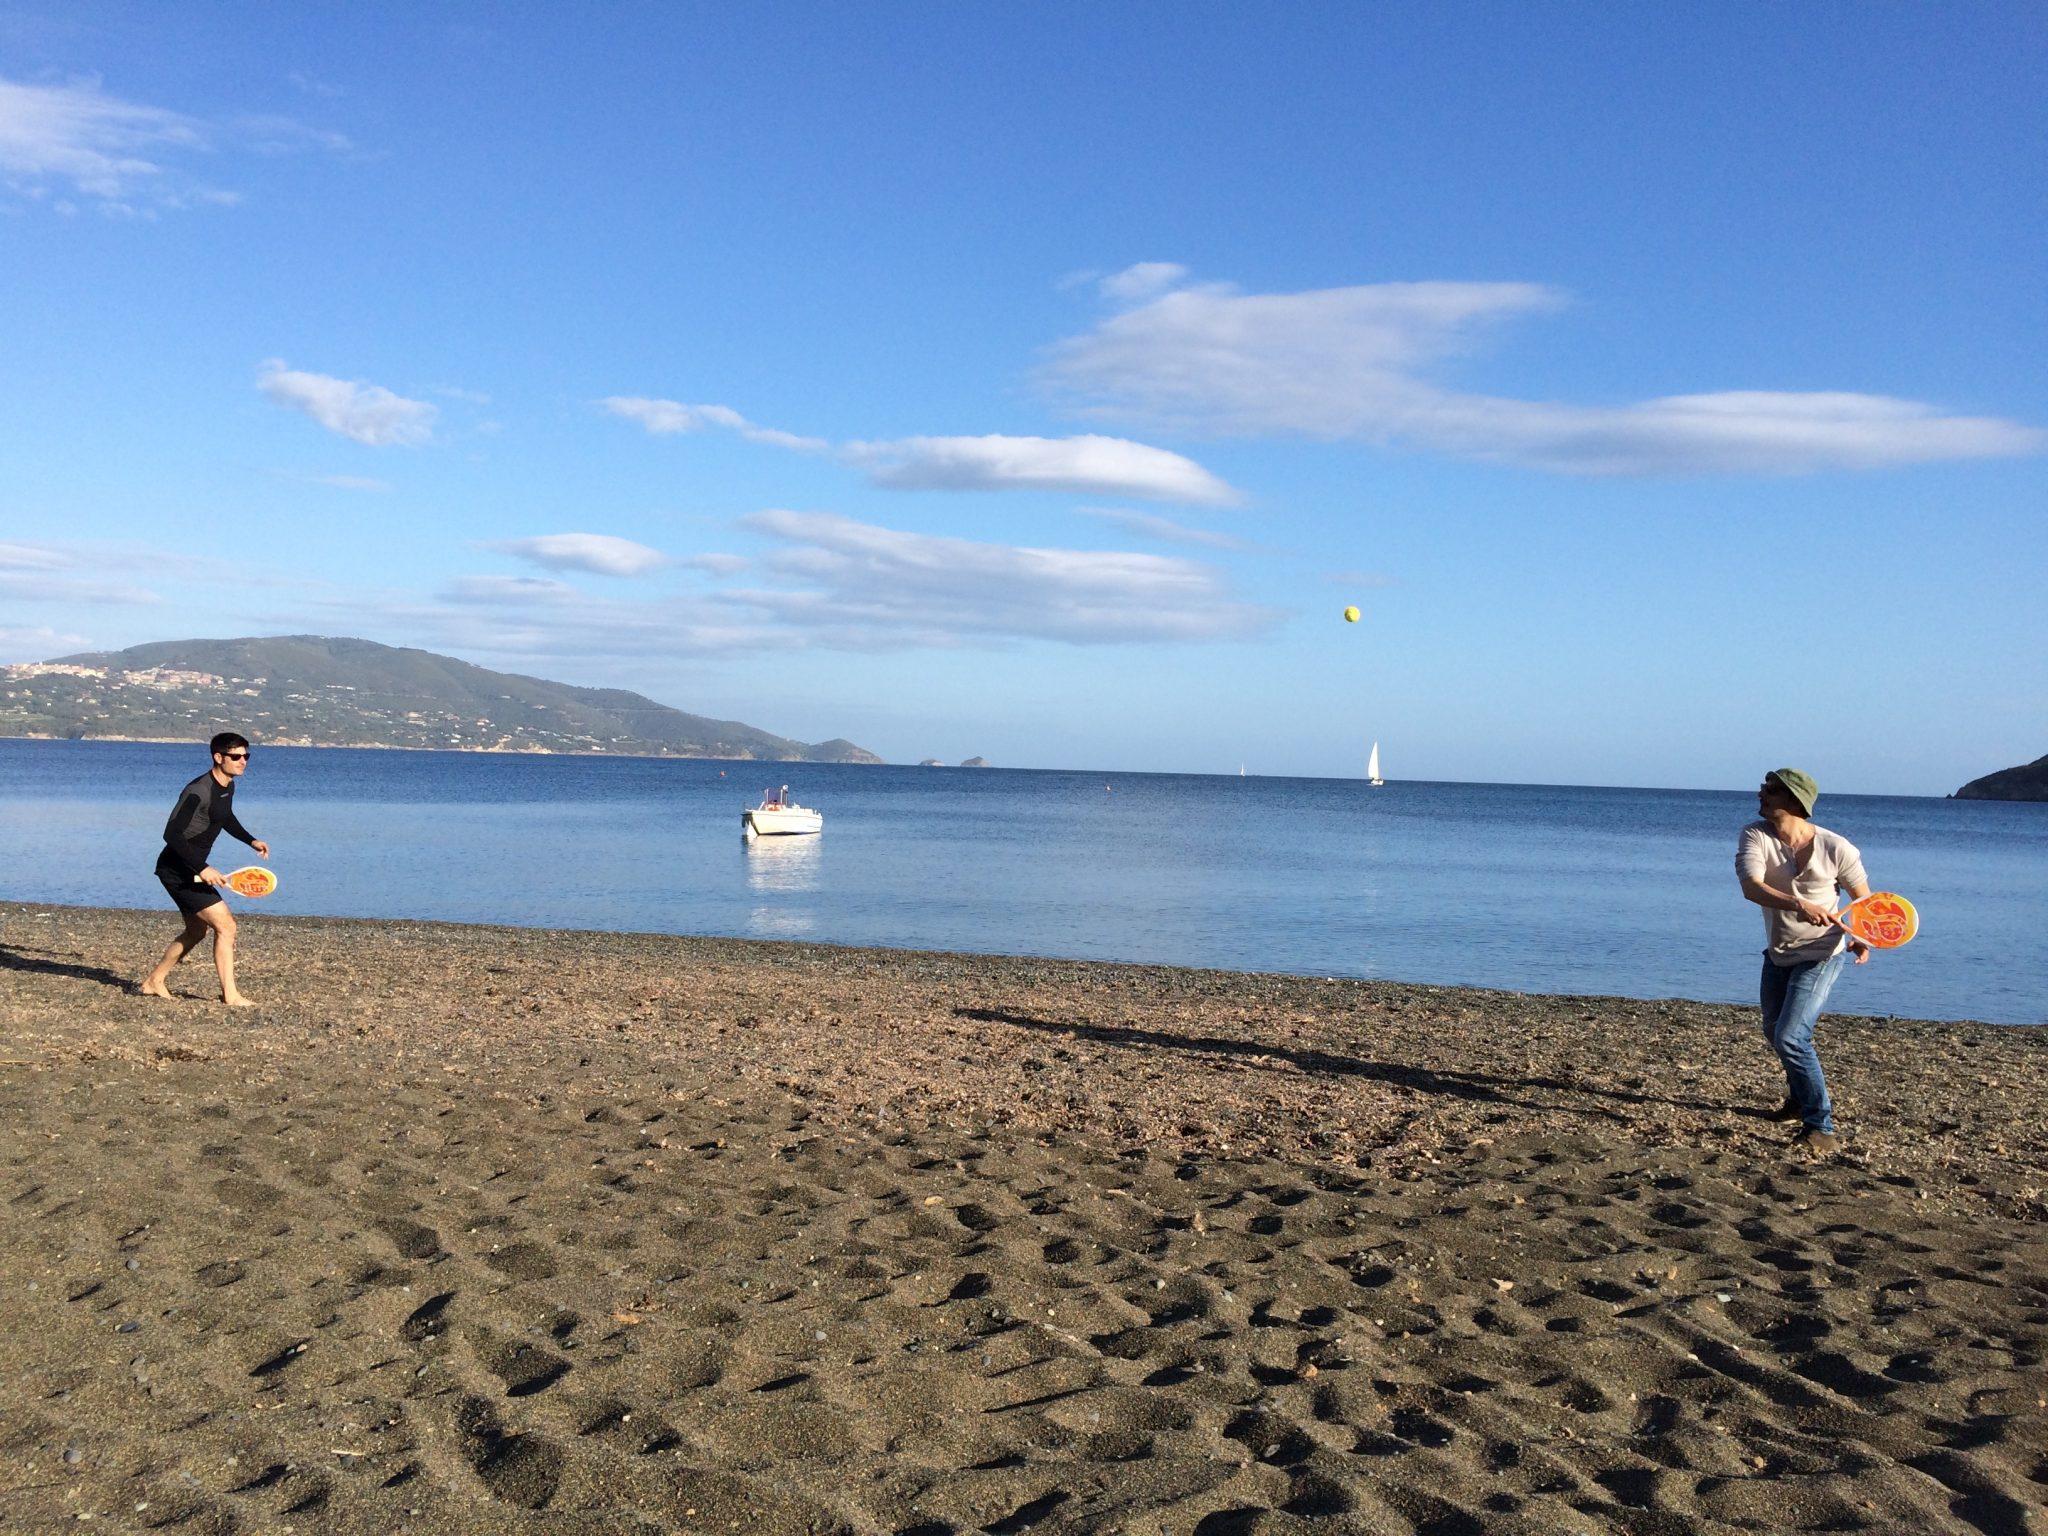 Playing rackets at Elba island